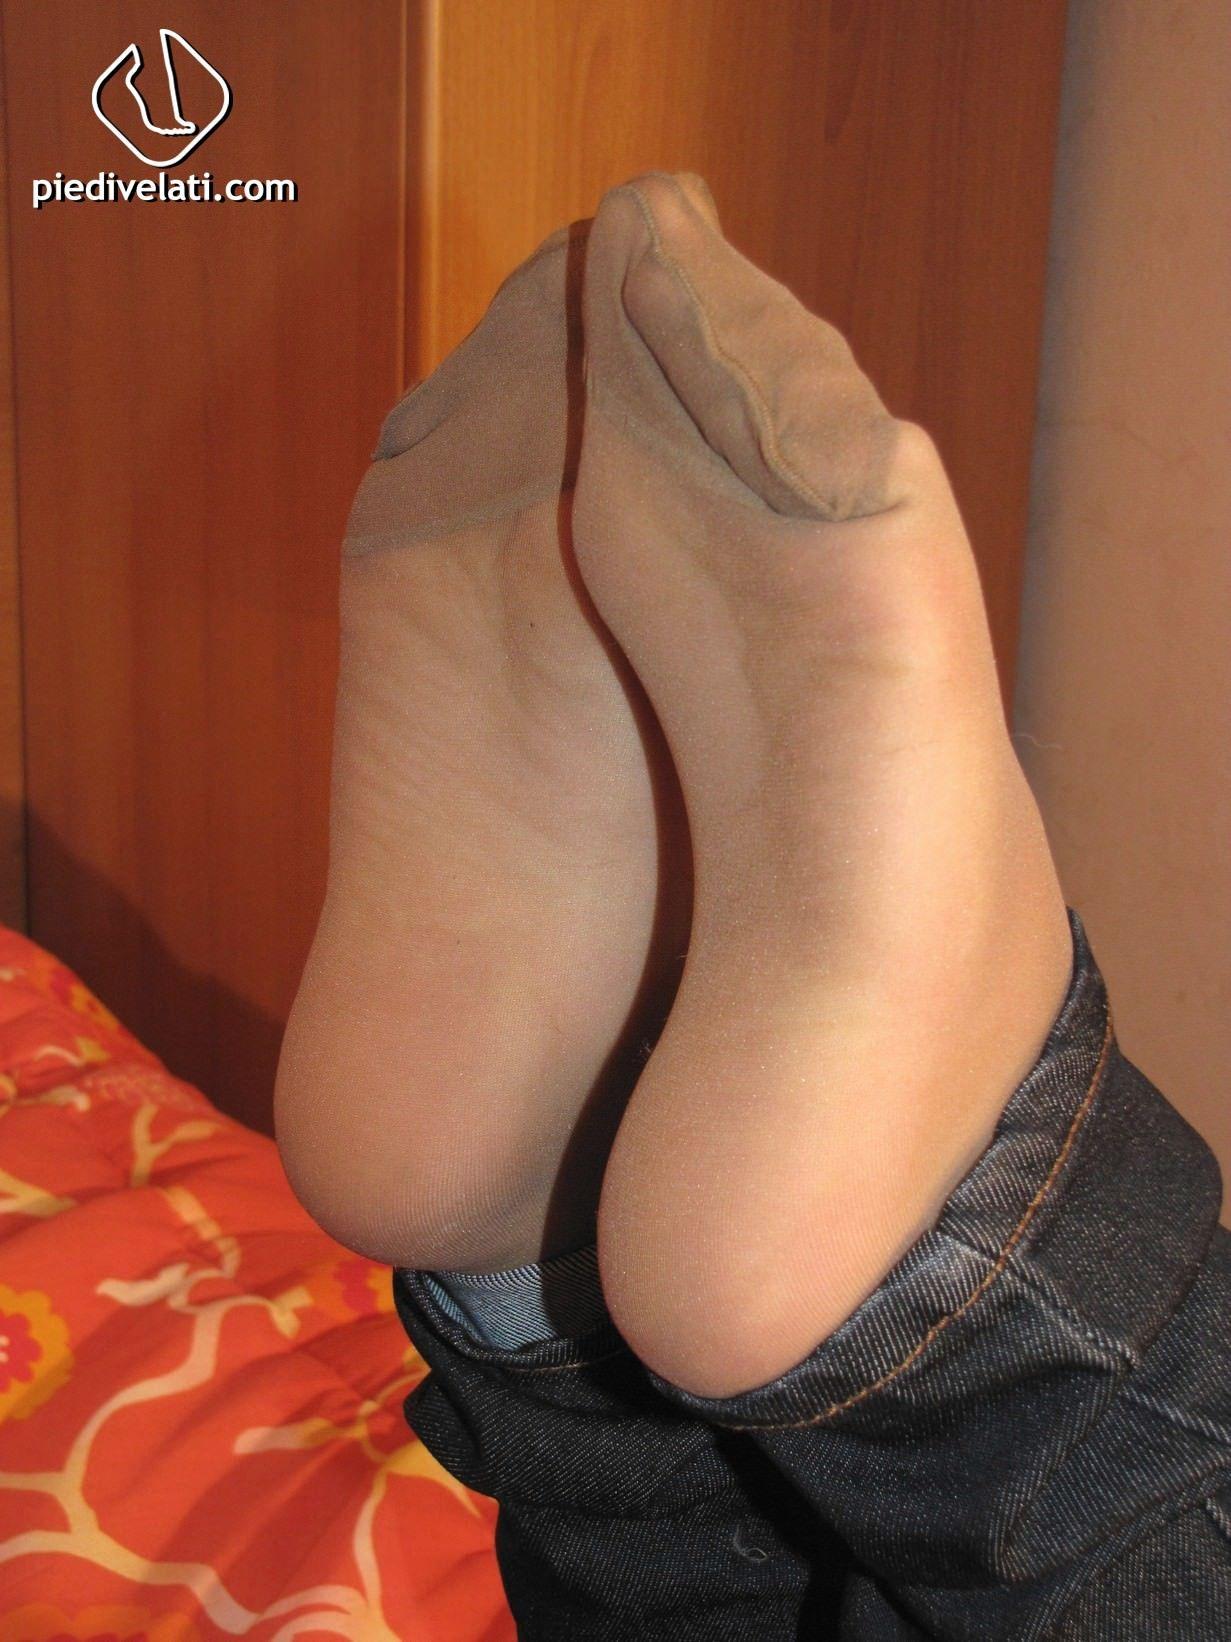 Feet Sue Perkins nudes (36 photo), Pussy, Paparazzi, Selfie, panties 2017